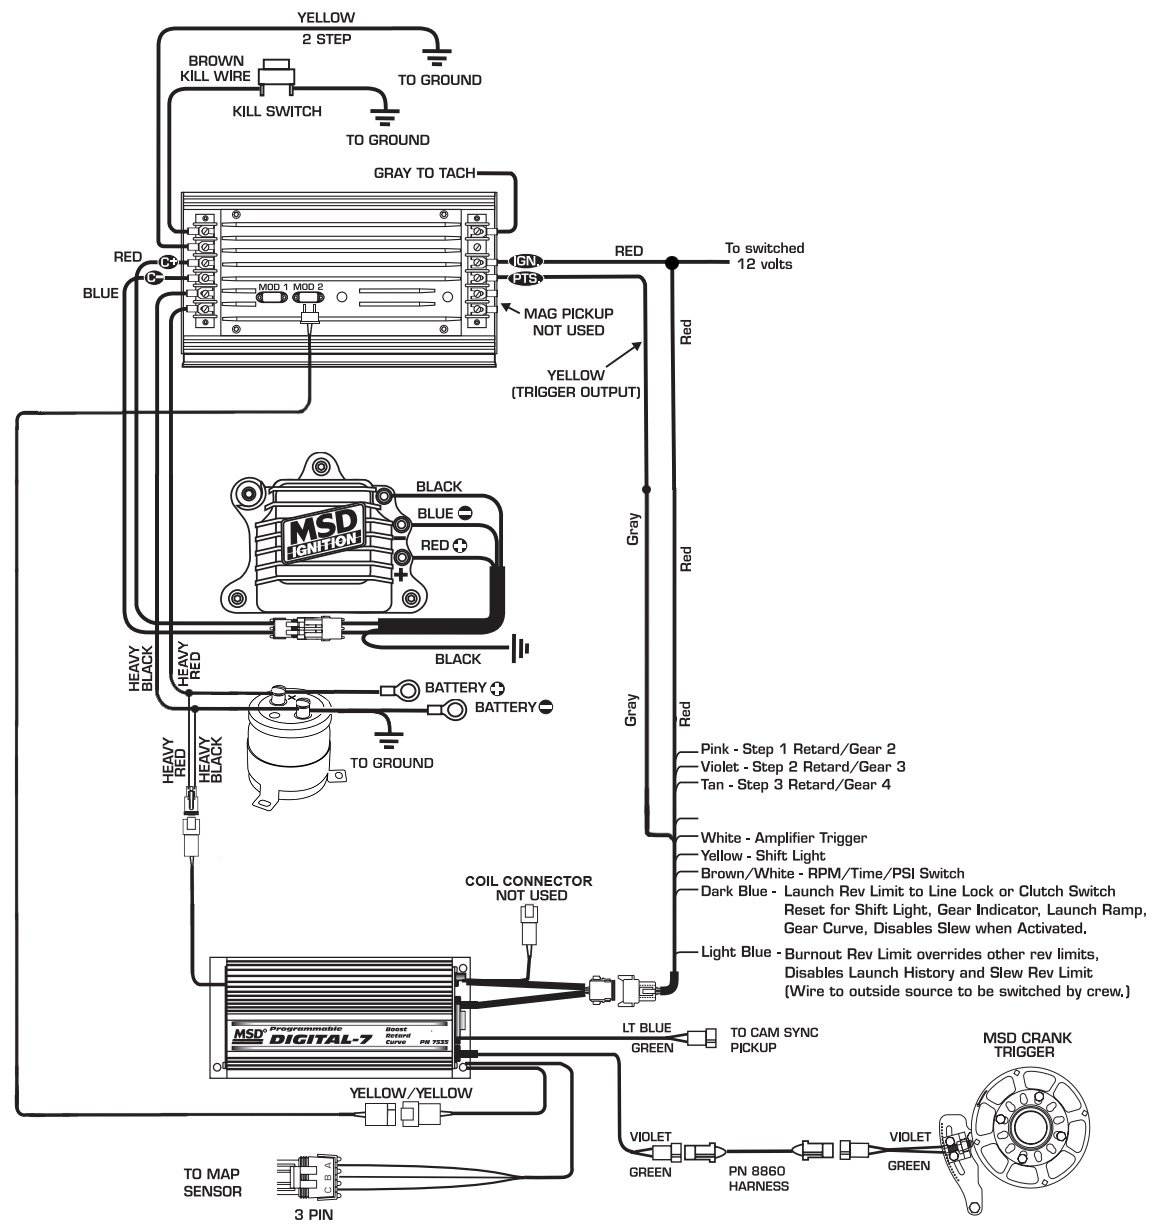 2002 jeep wrangler ignition wiring diagram model railway diagrams msd 8950 tab organisedmum de a8e lektionenderliebe u2022 rh